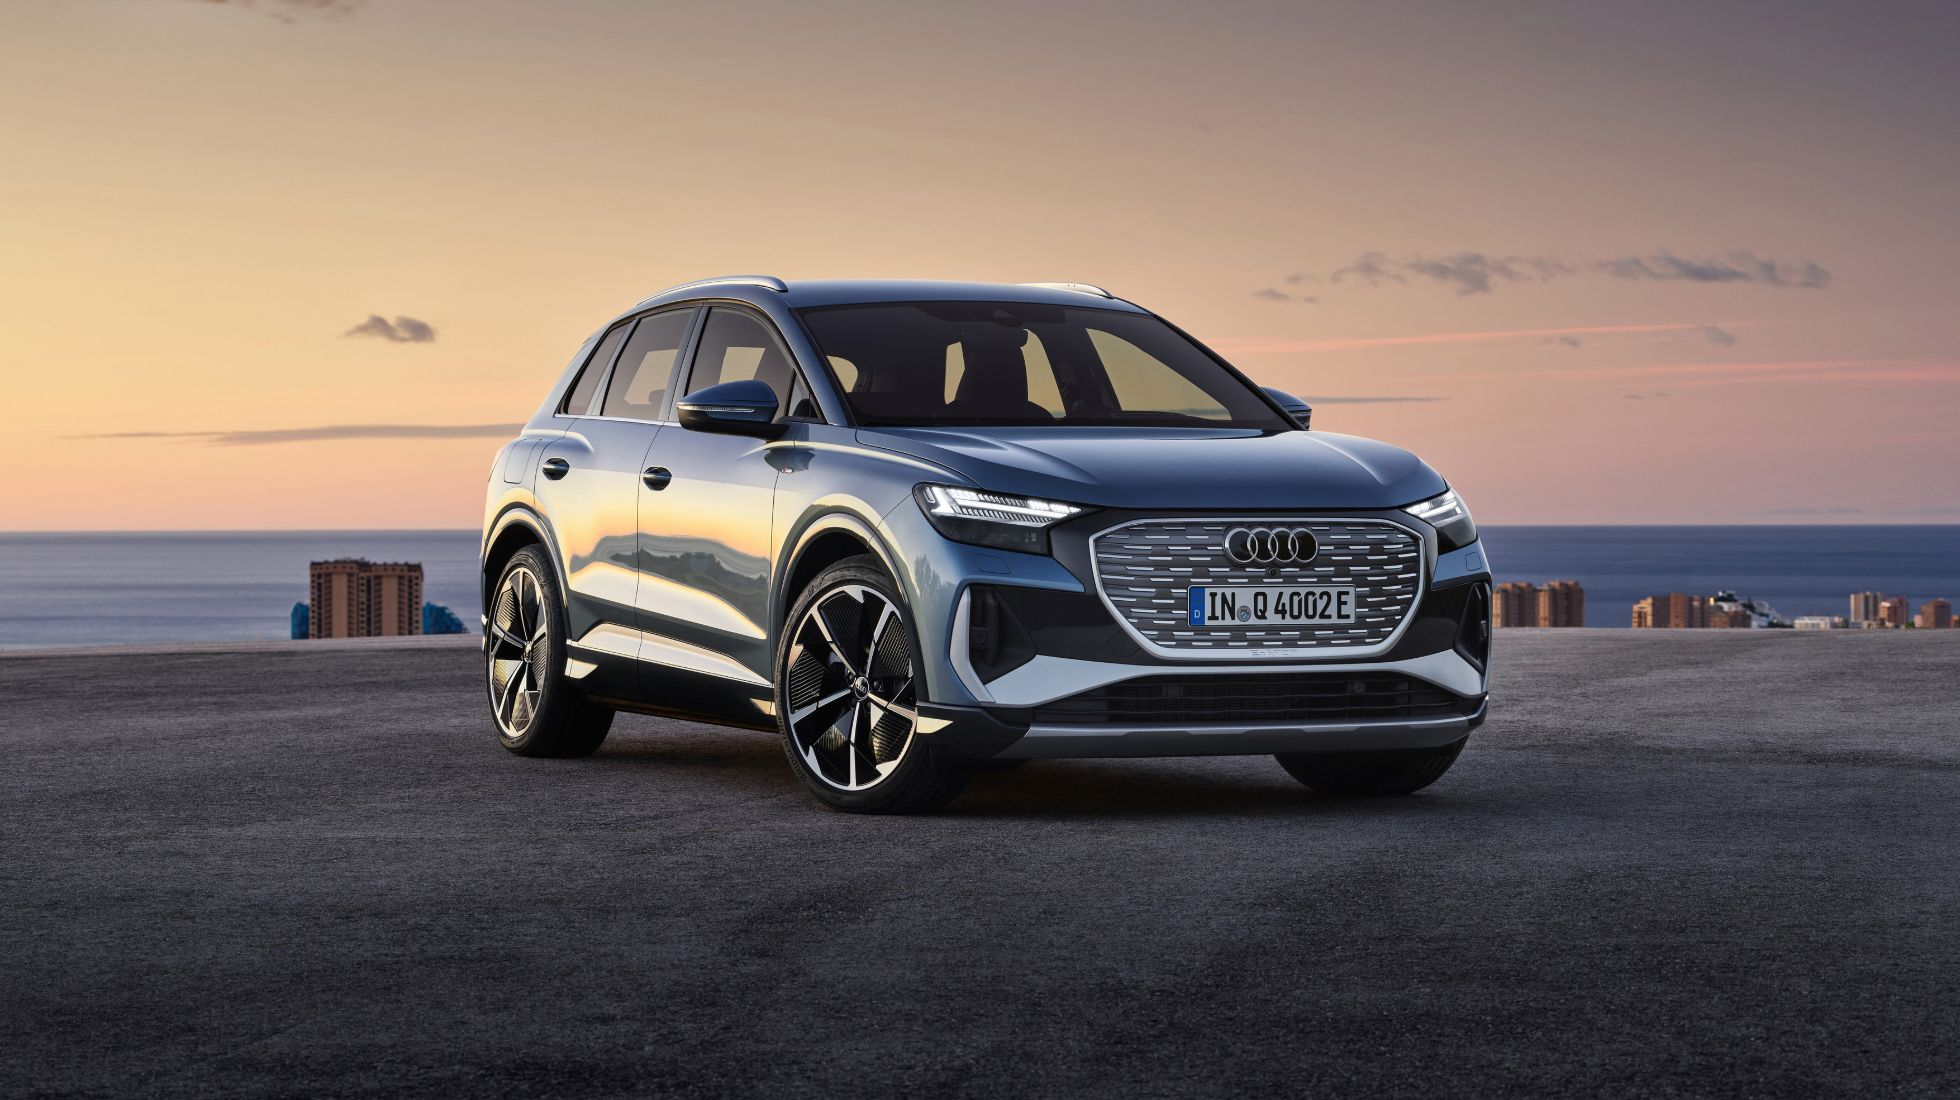 Audi has unveiled the Q4 e-tron SUV